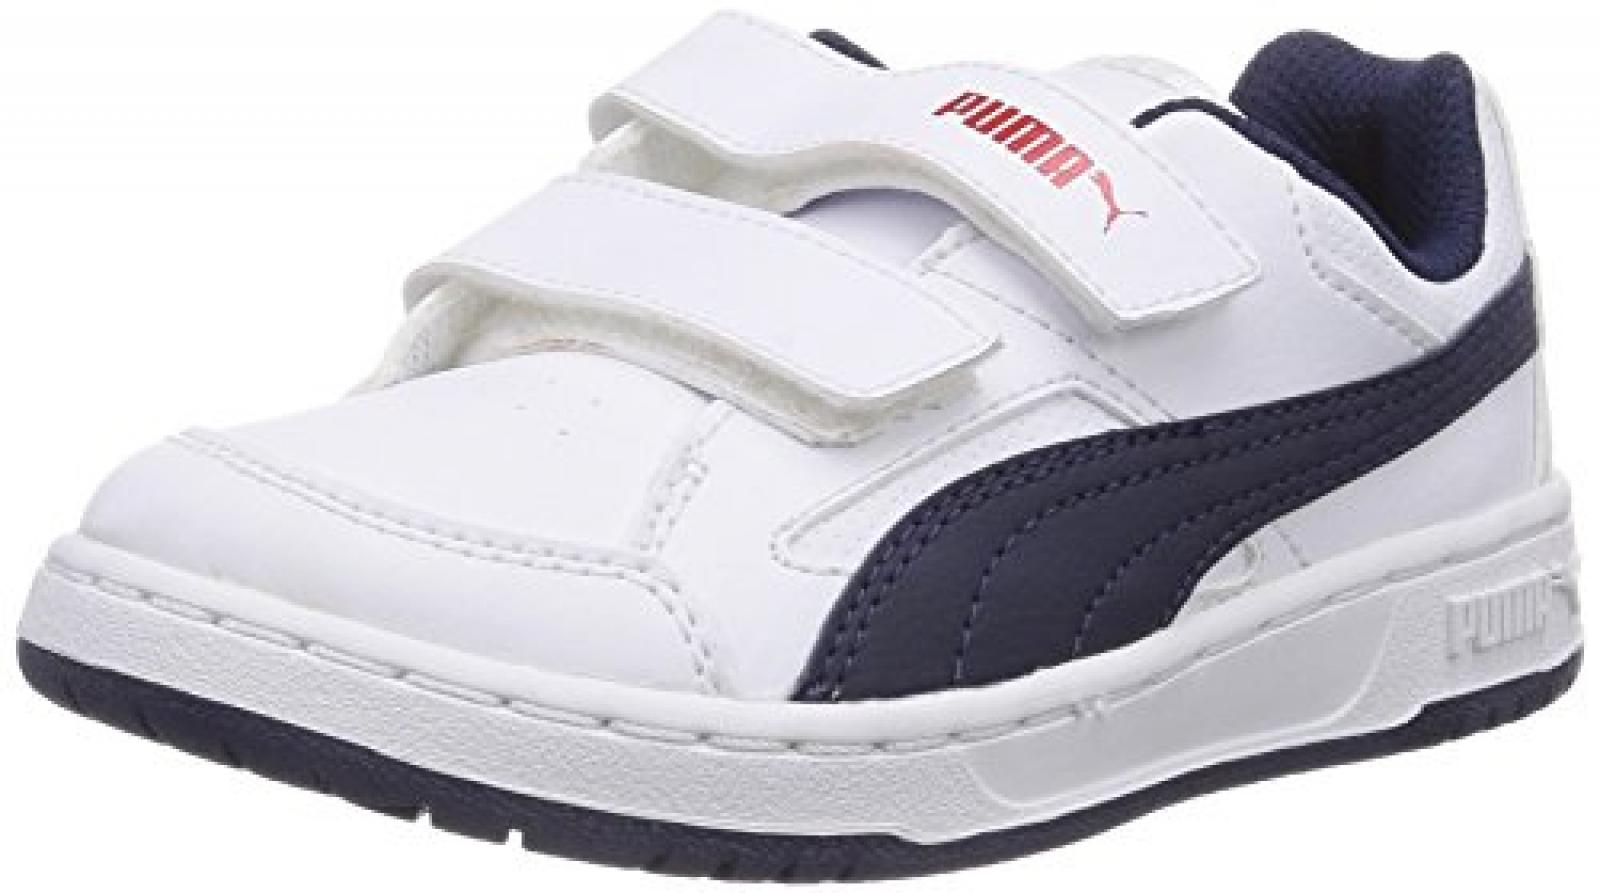 Puma Rebound v2 Lo Unisex-Kinder Sneakers